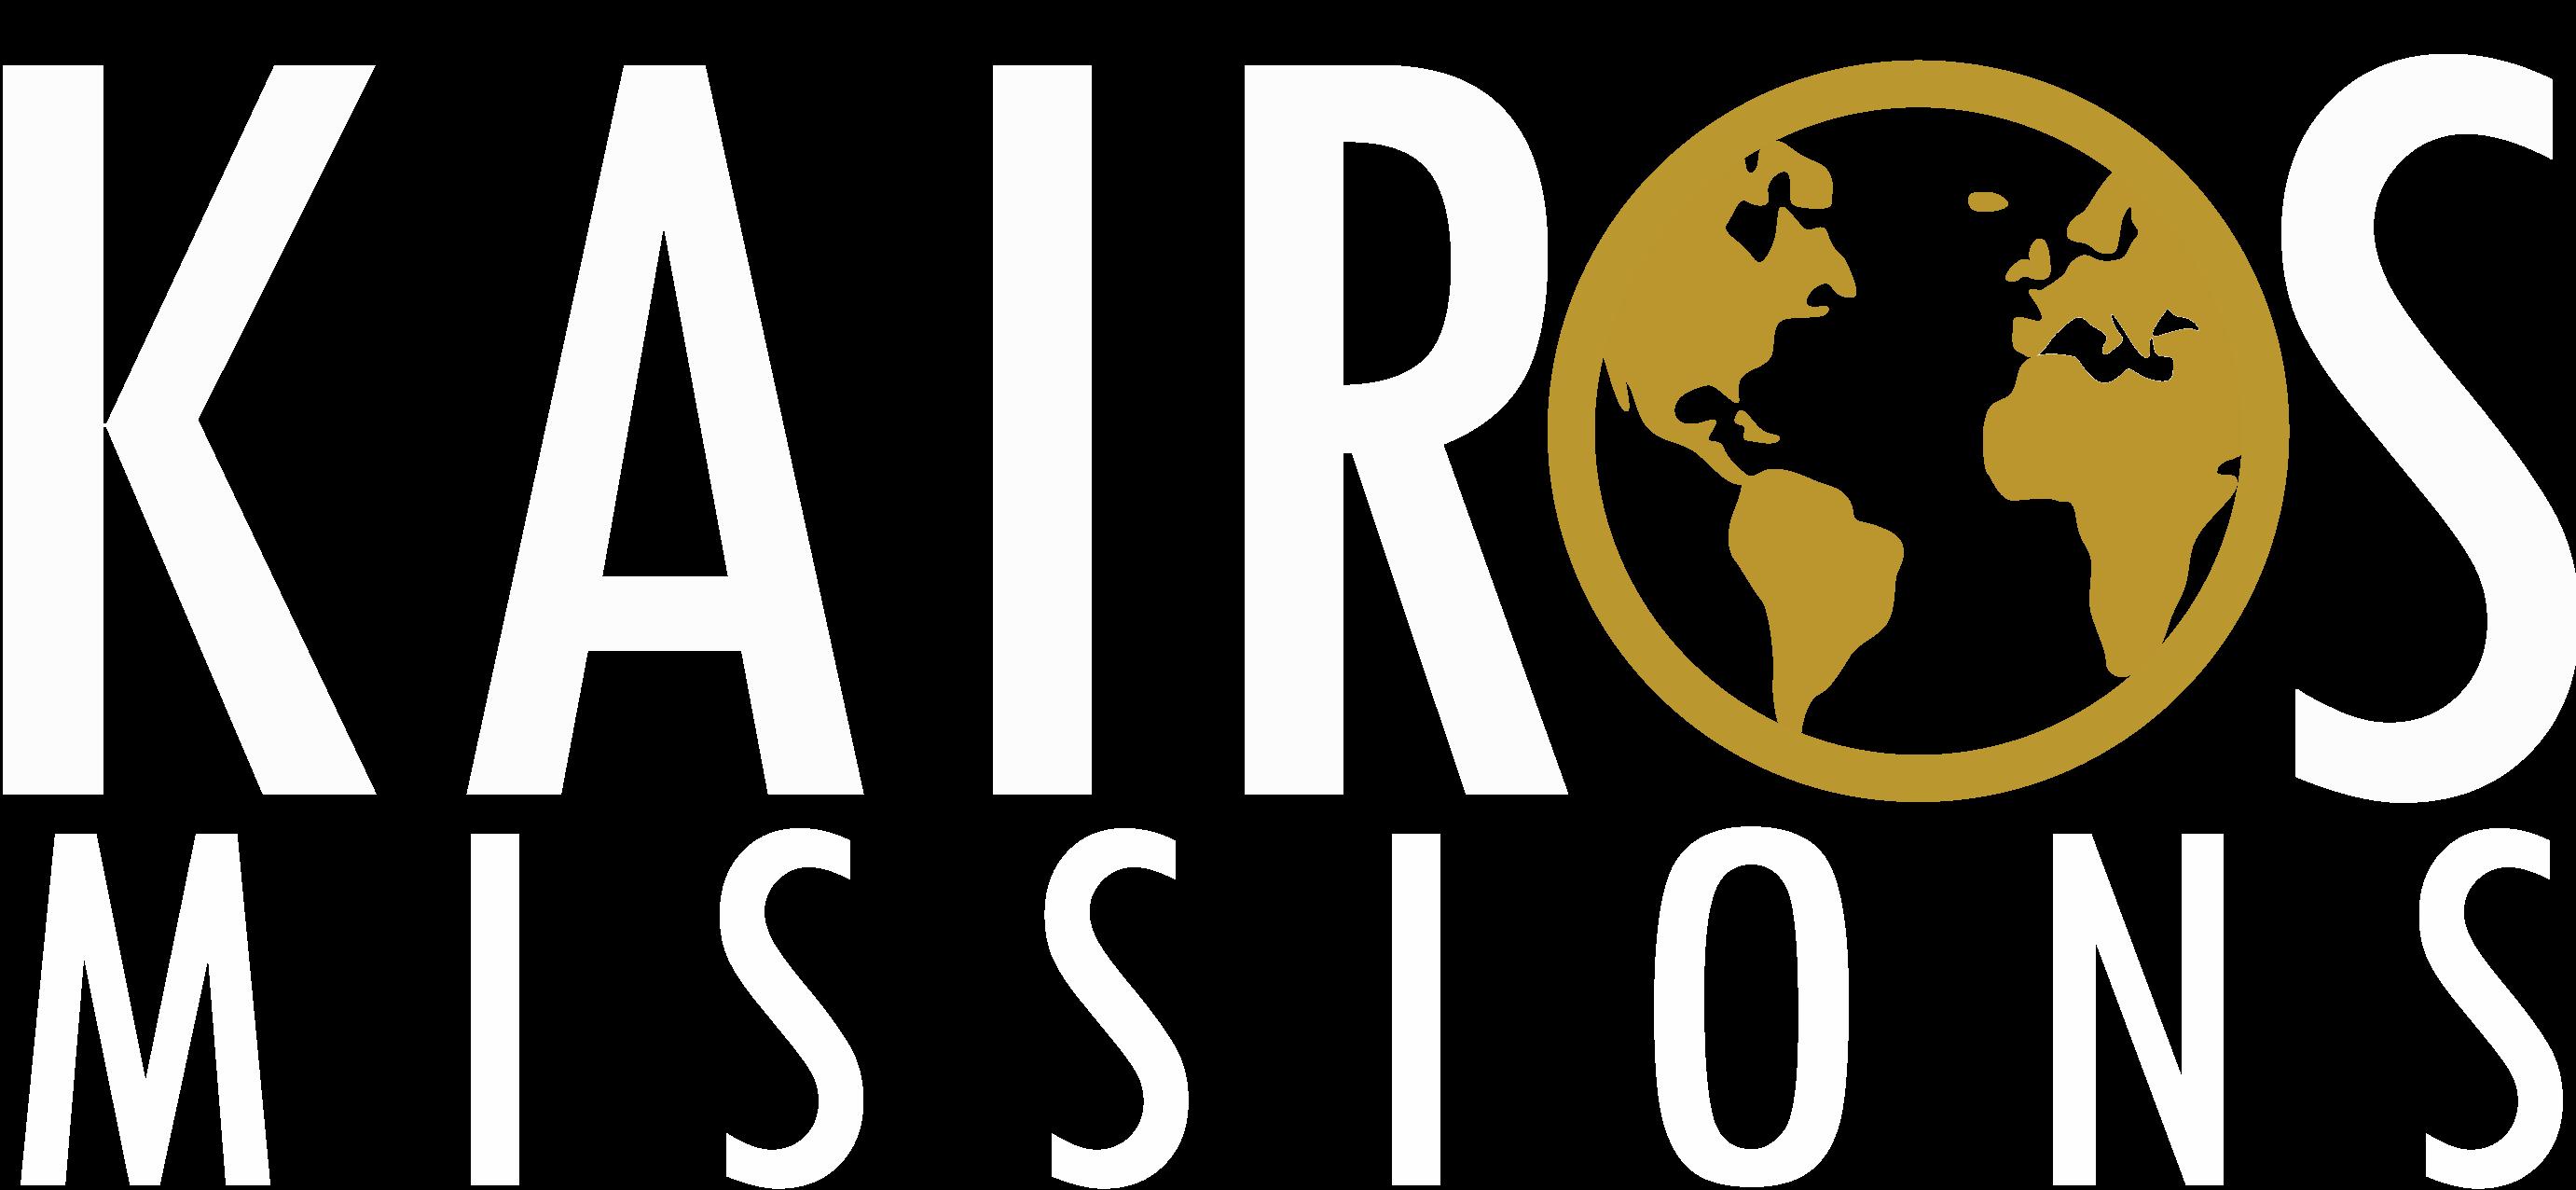 Kairos Missions